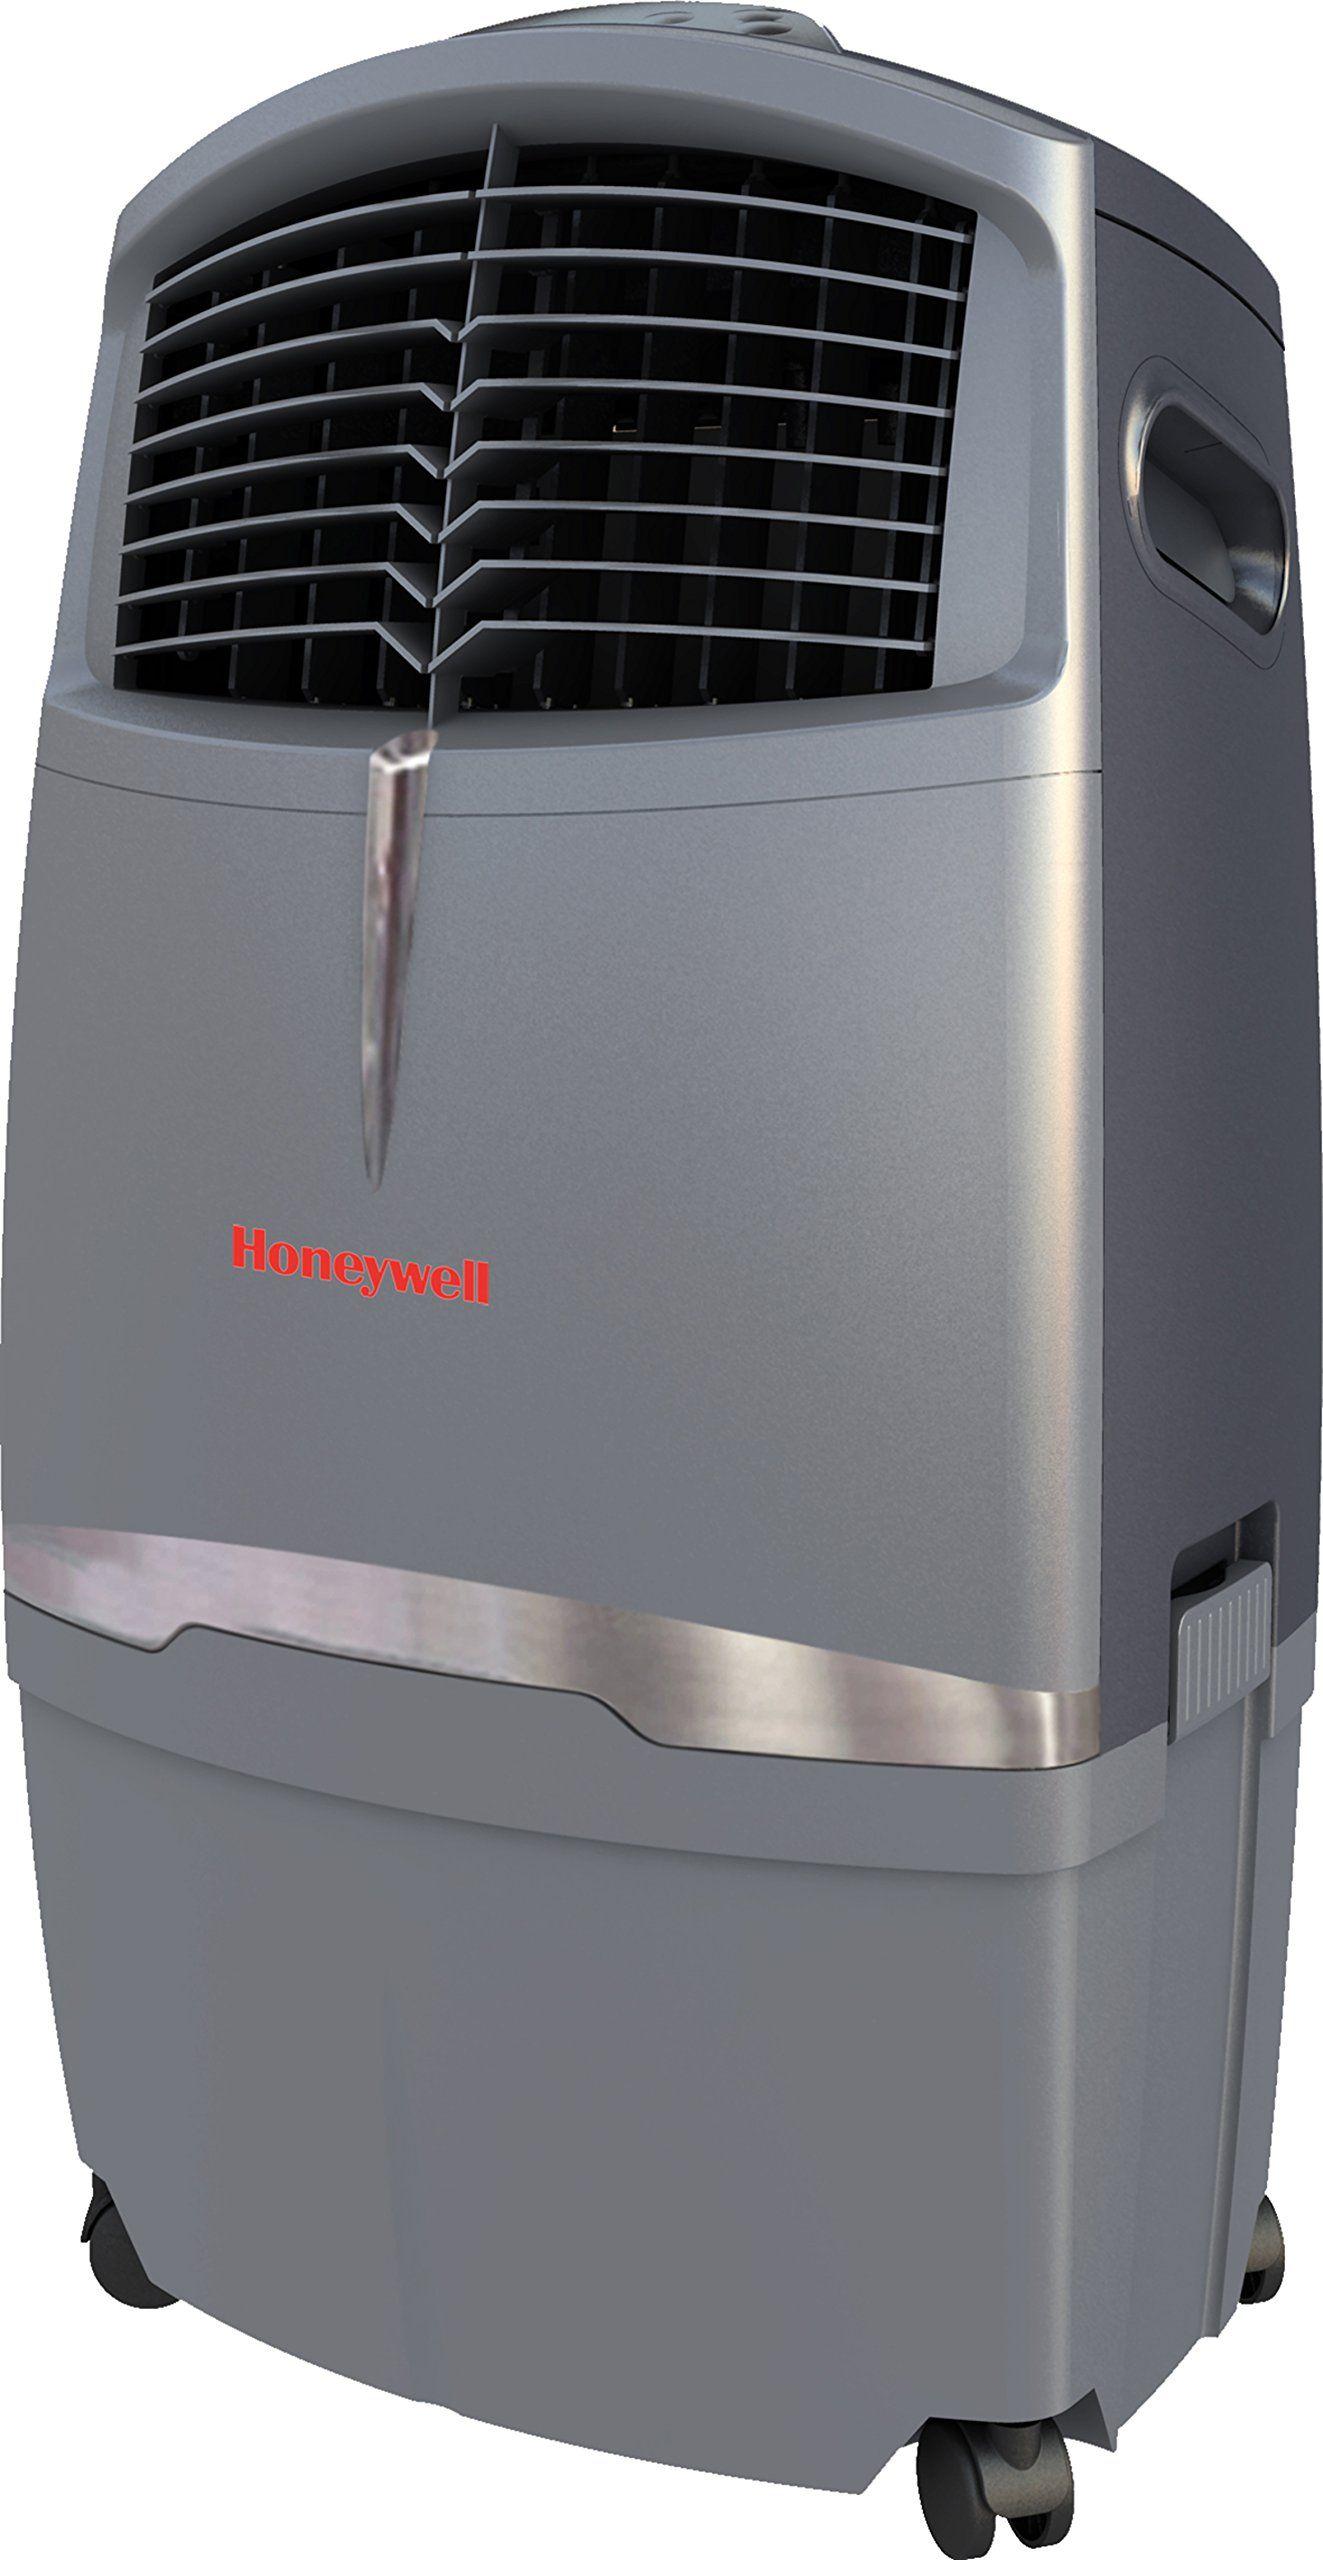 Honeywell CL30XC 63 Pt. Indoor Portable Evaporative Air